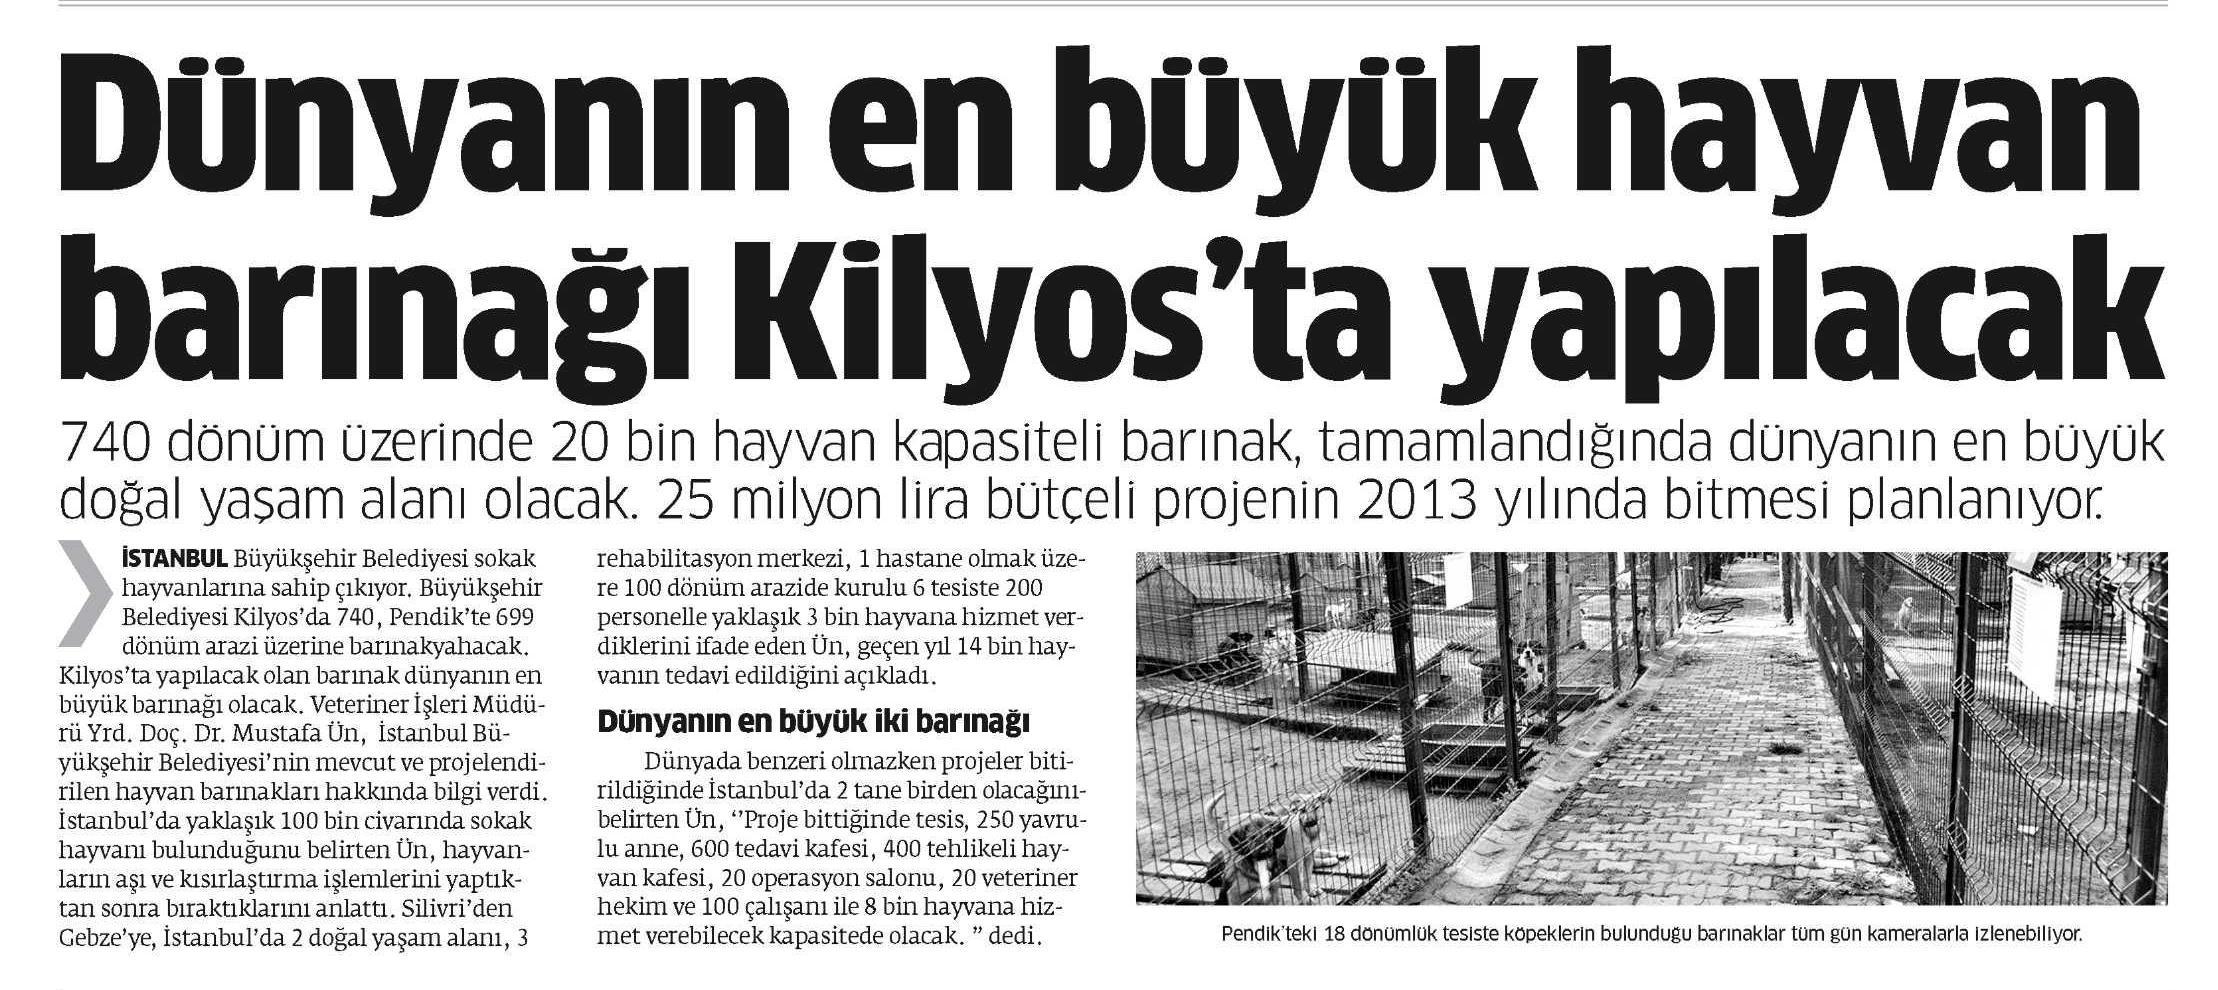 16.12.2012_star_barinak